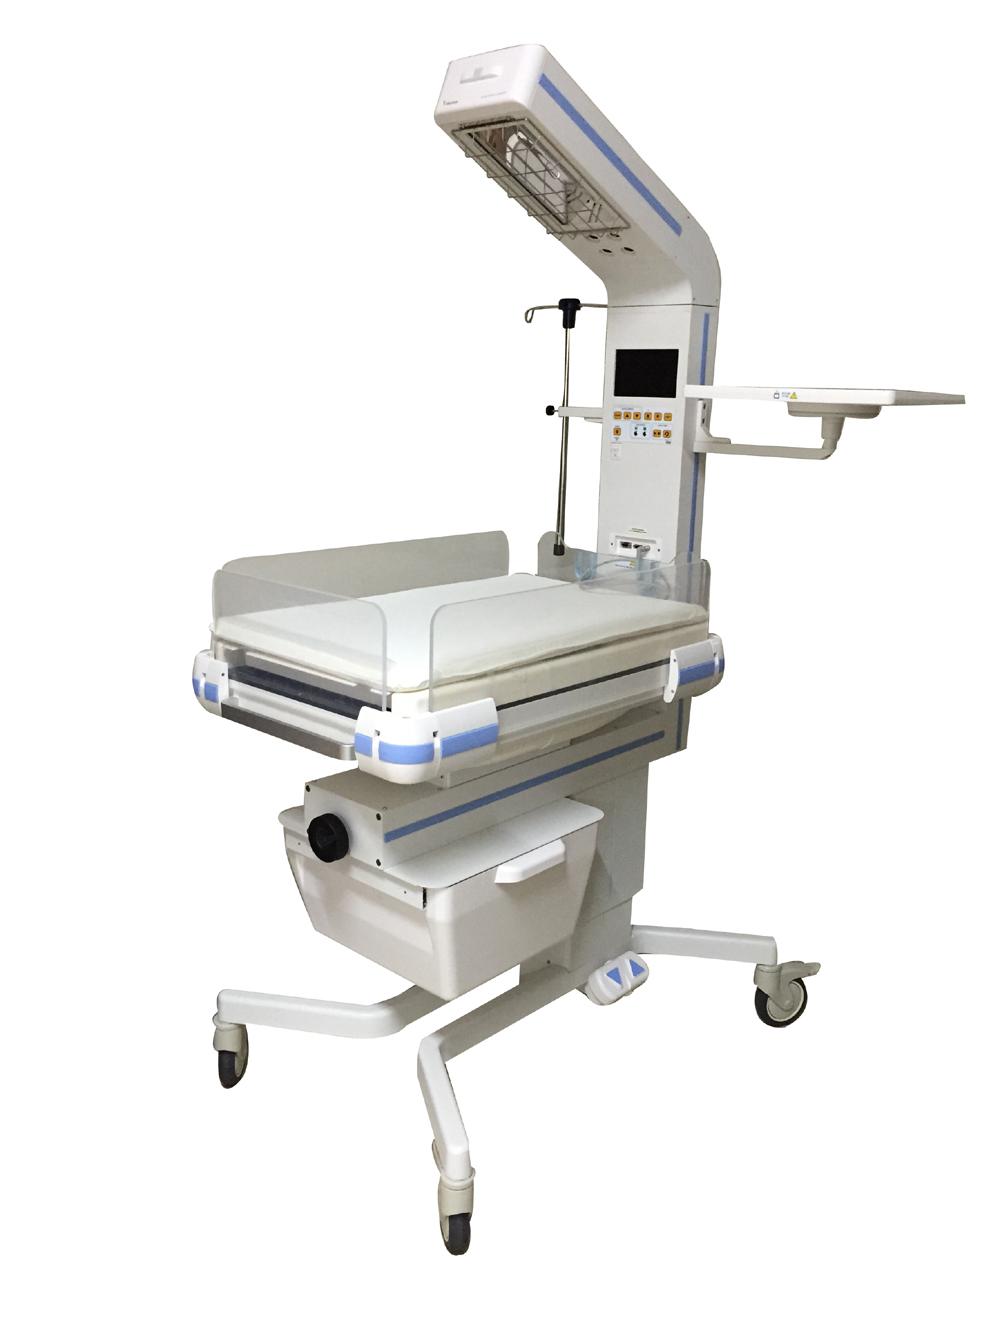 Medical Obstetrics & Gynecology Equipment, Infant Warmer BT-550